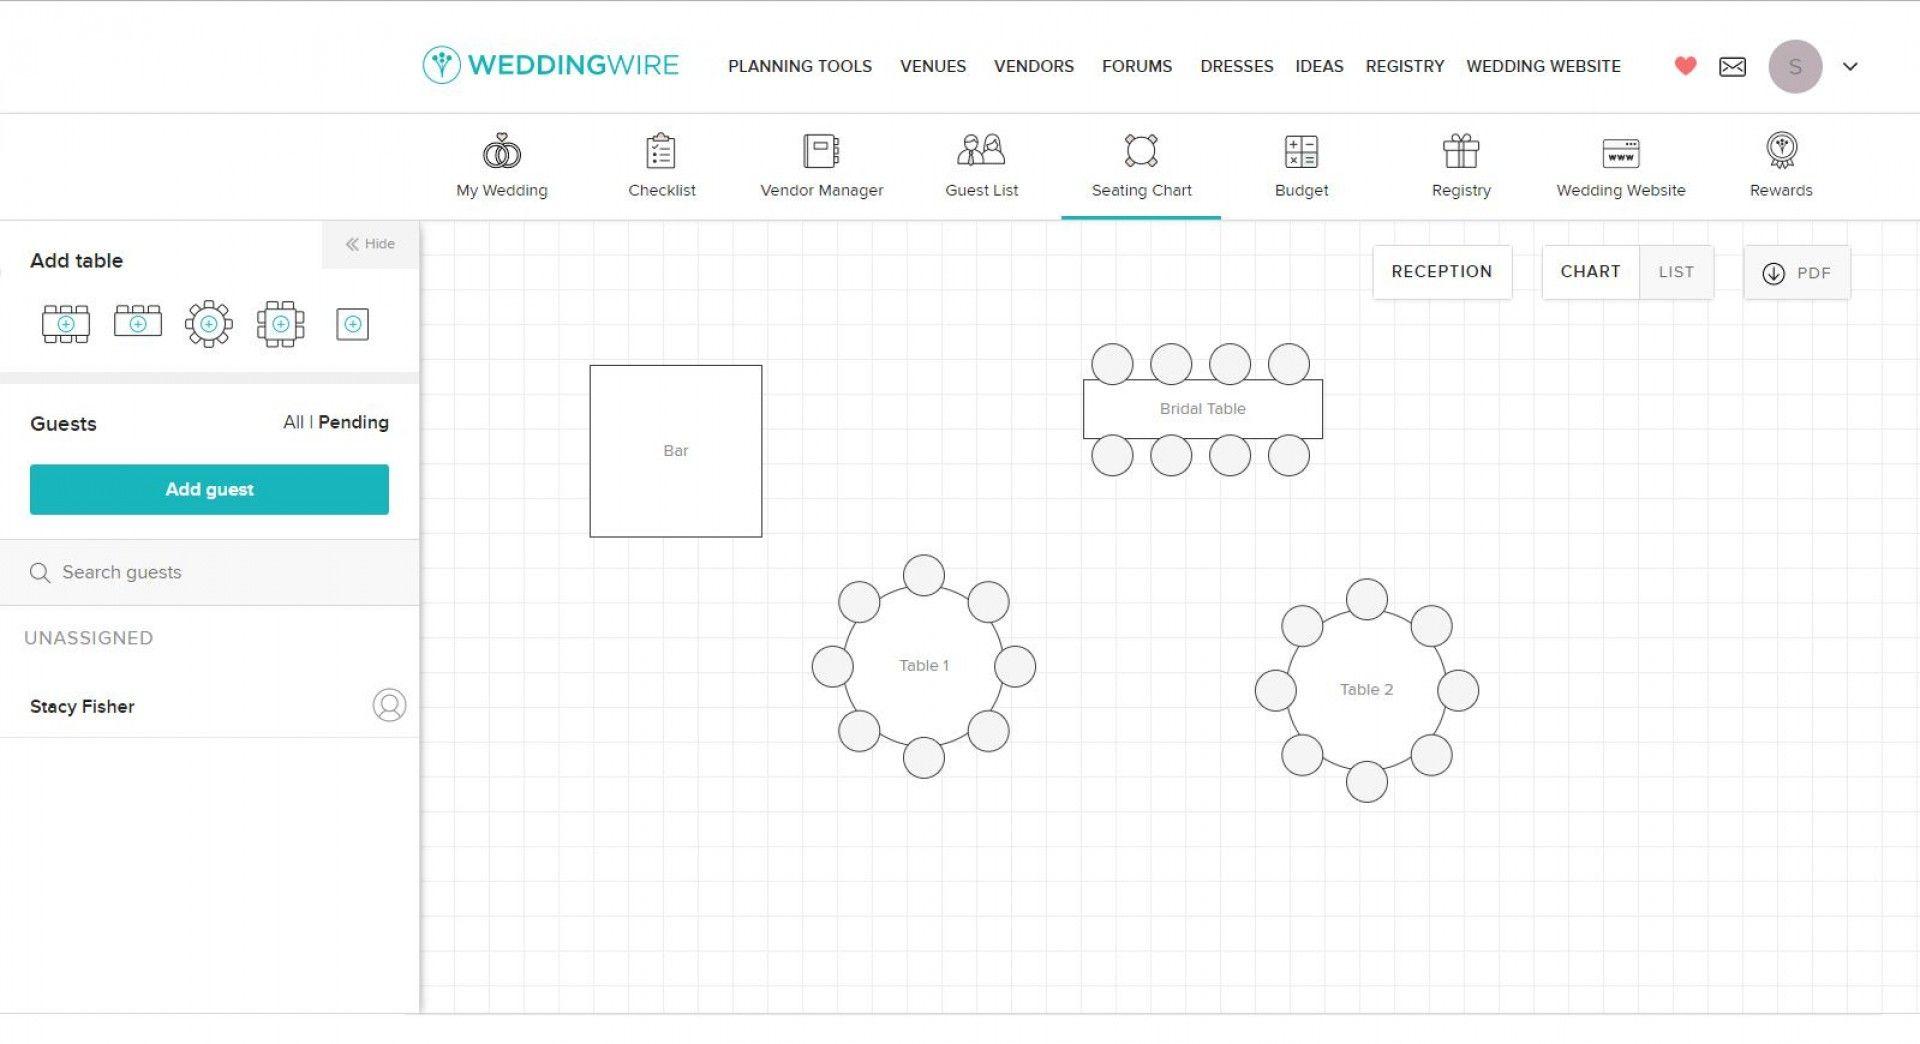 016 Wedding Seating Chart Template Idea Guest Plan Excel Within Weddin Seating Chart Wedding Template Wedding Table Seating Chart Wedding Seating Plan Template Wedding seating chart template excel